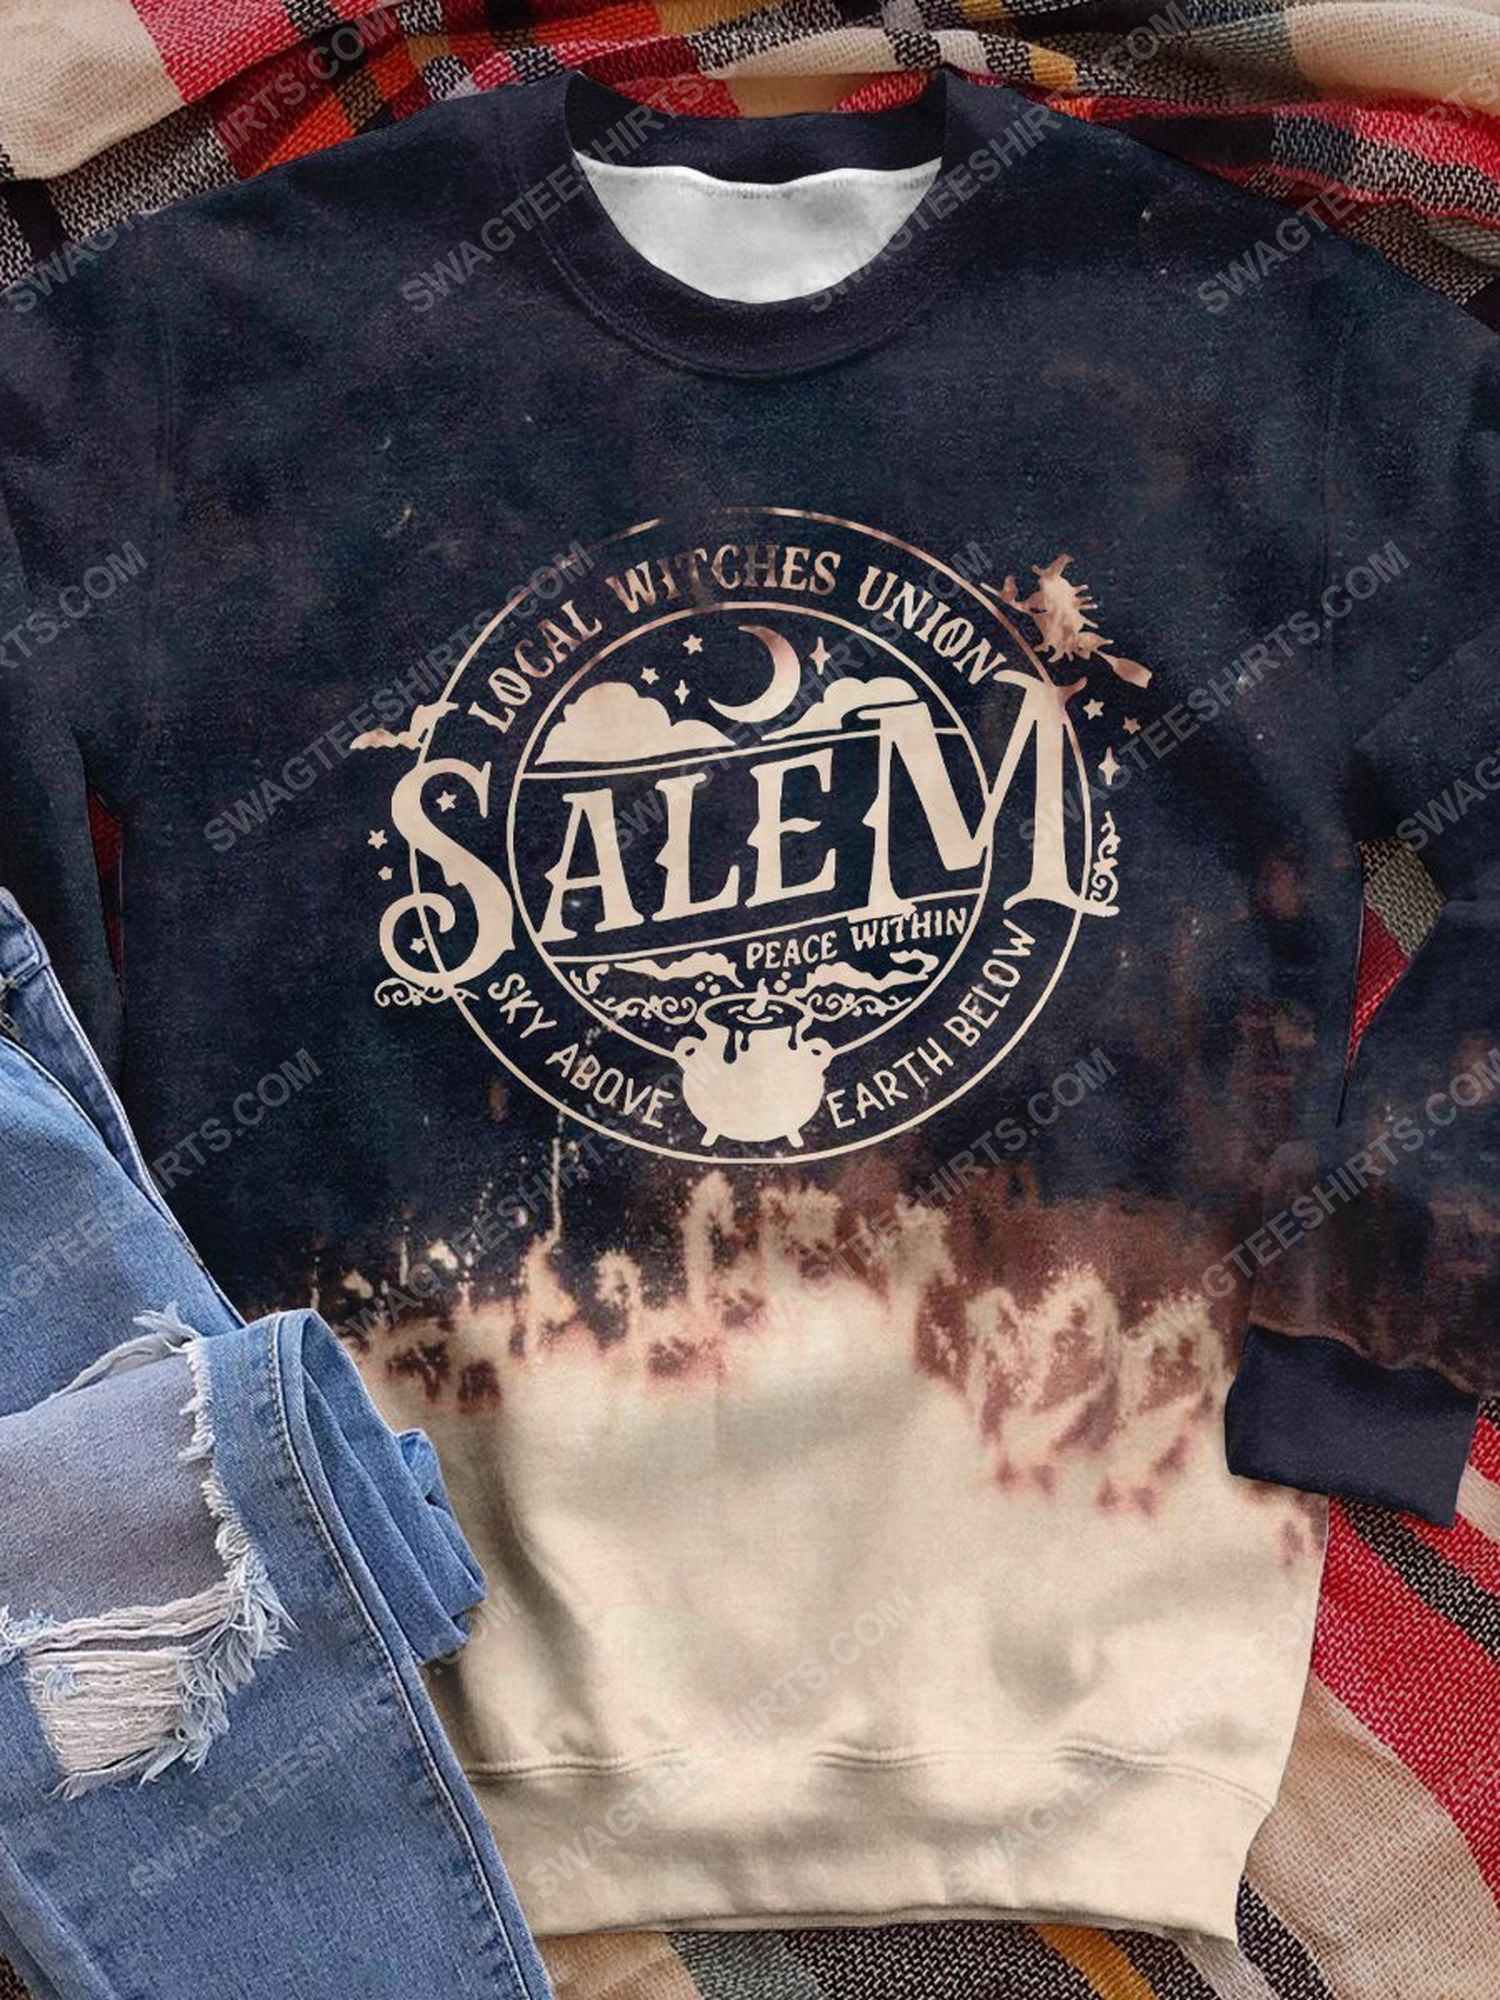 Halloween night local witches union salem shirt 1